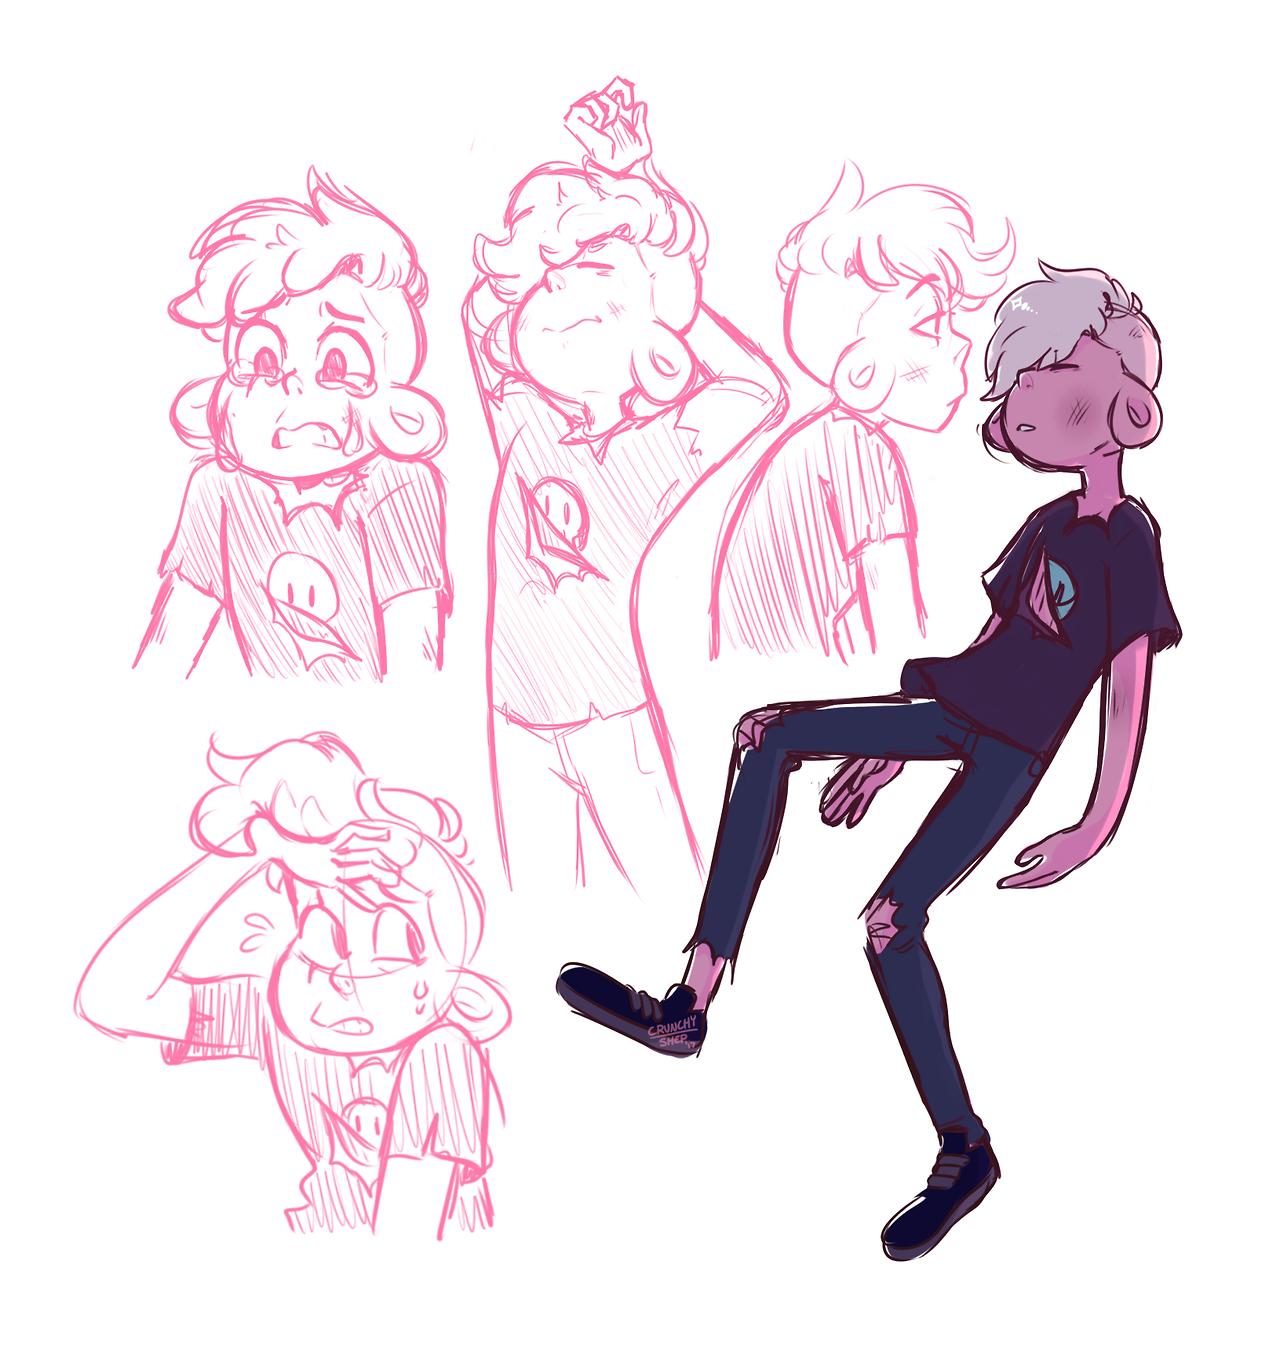 I really like drawing Lars